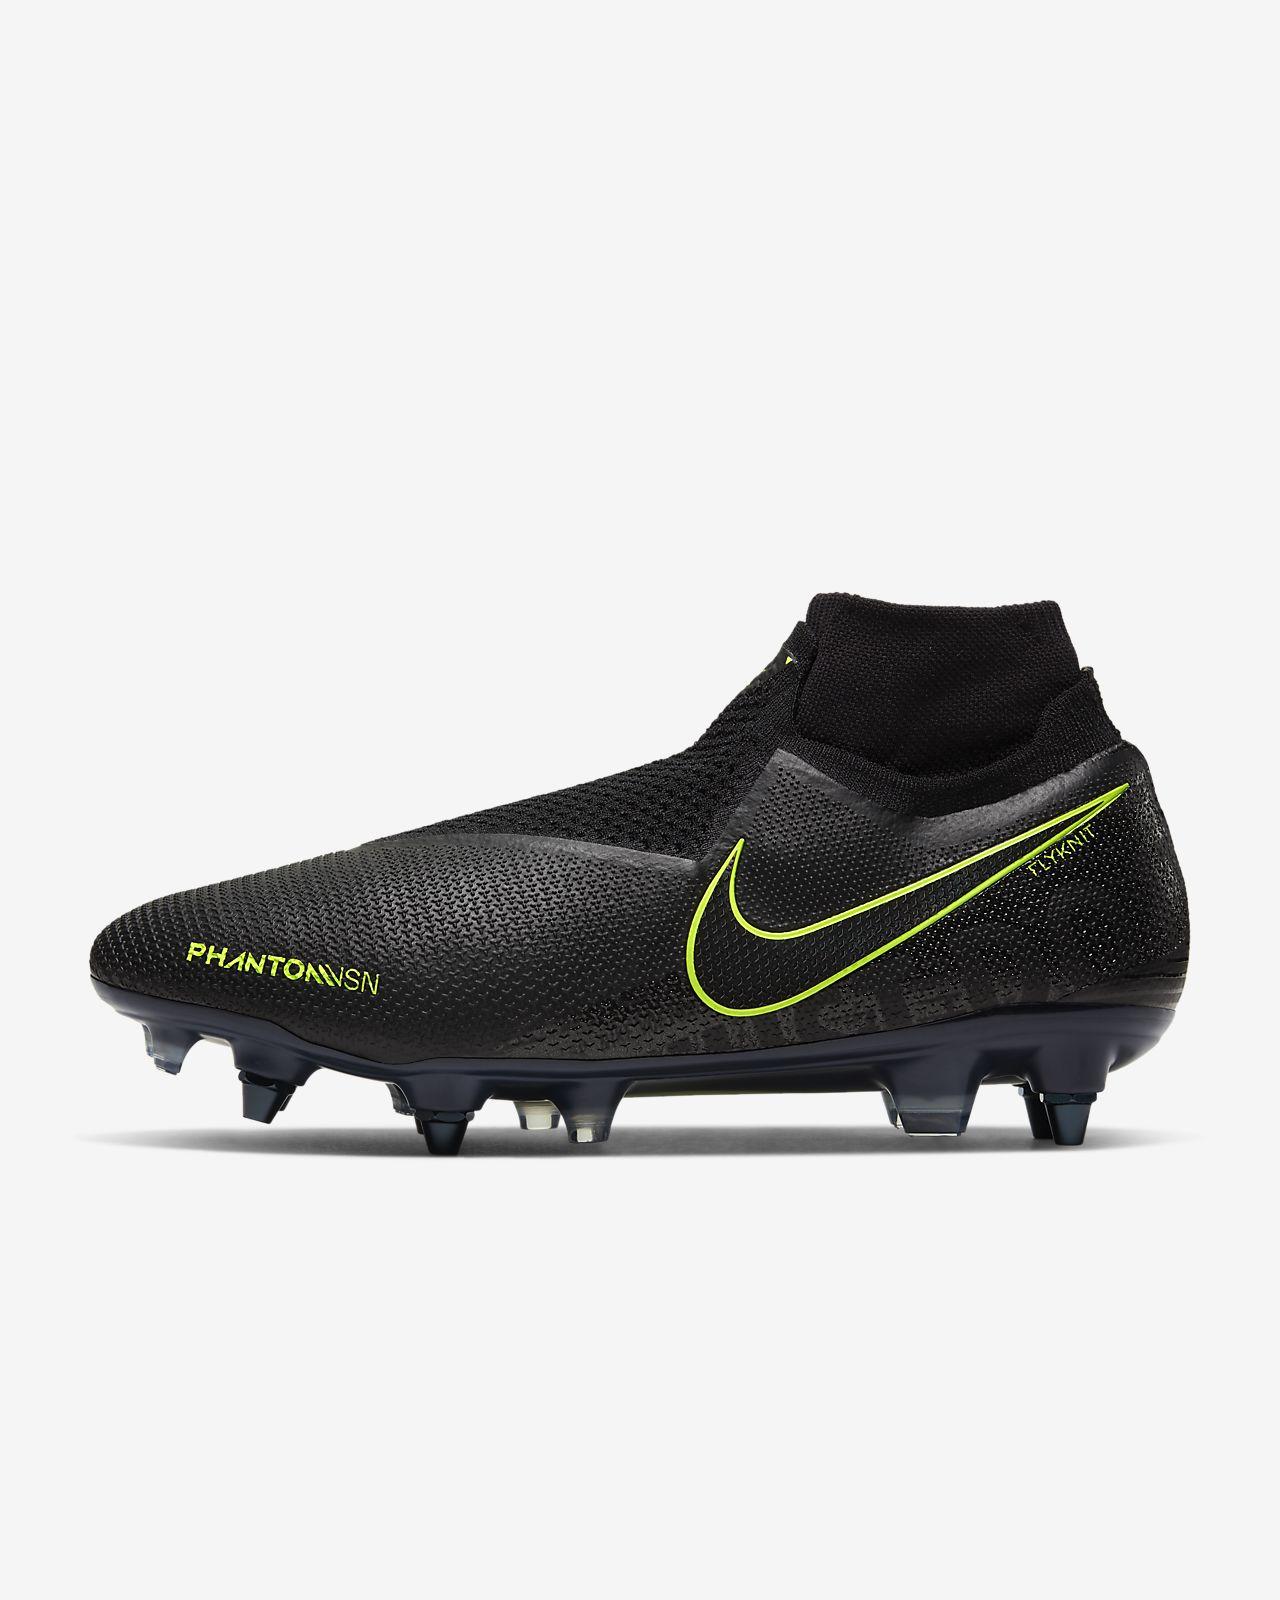 Nike Phantom Vision Elite Dynamic Fit Anti-Clog SG-PRO Botes de futbol